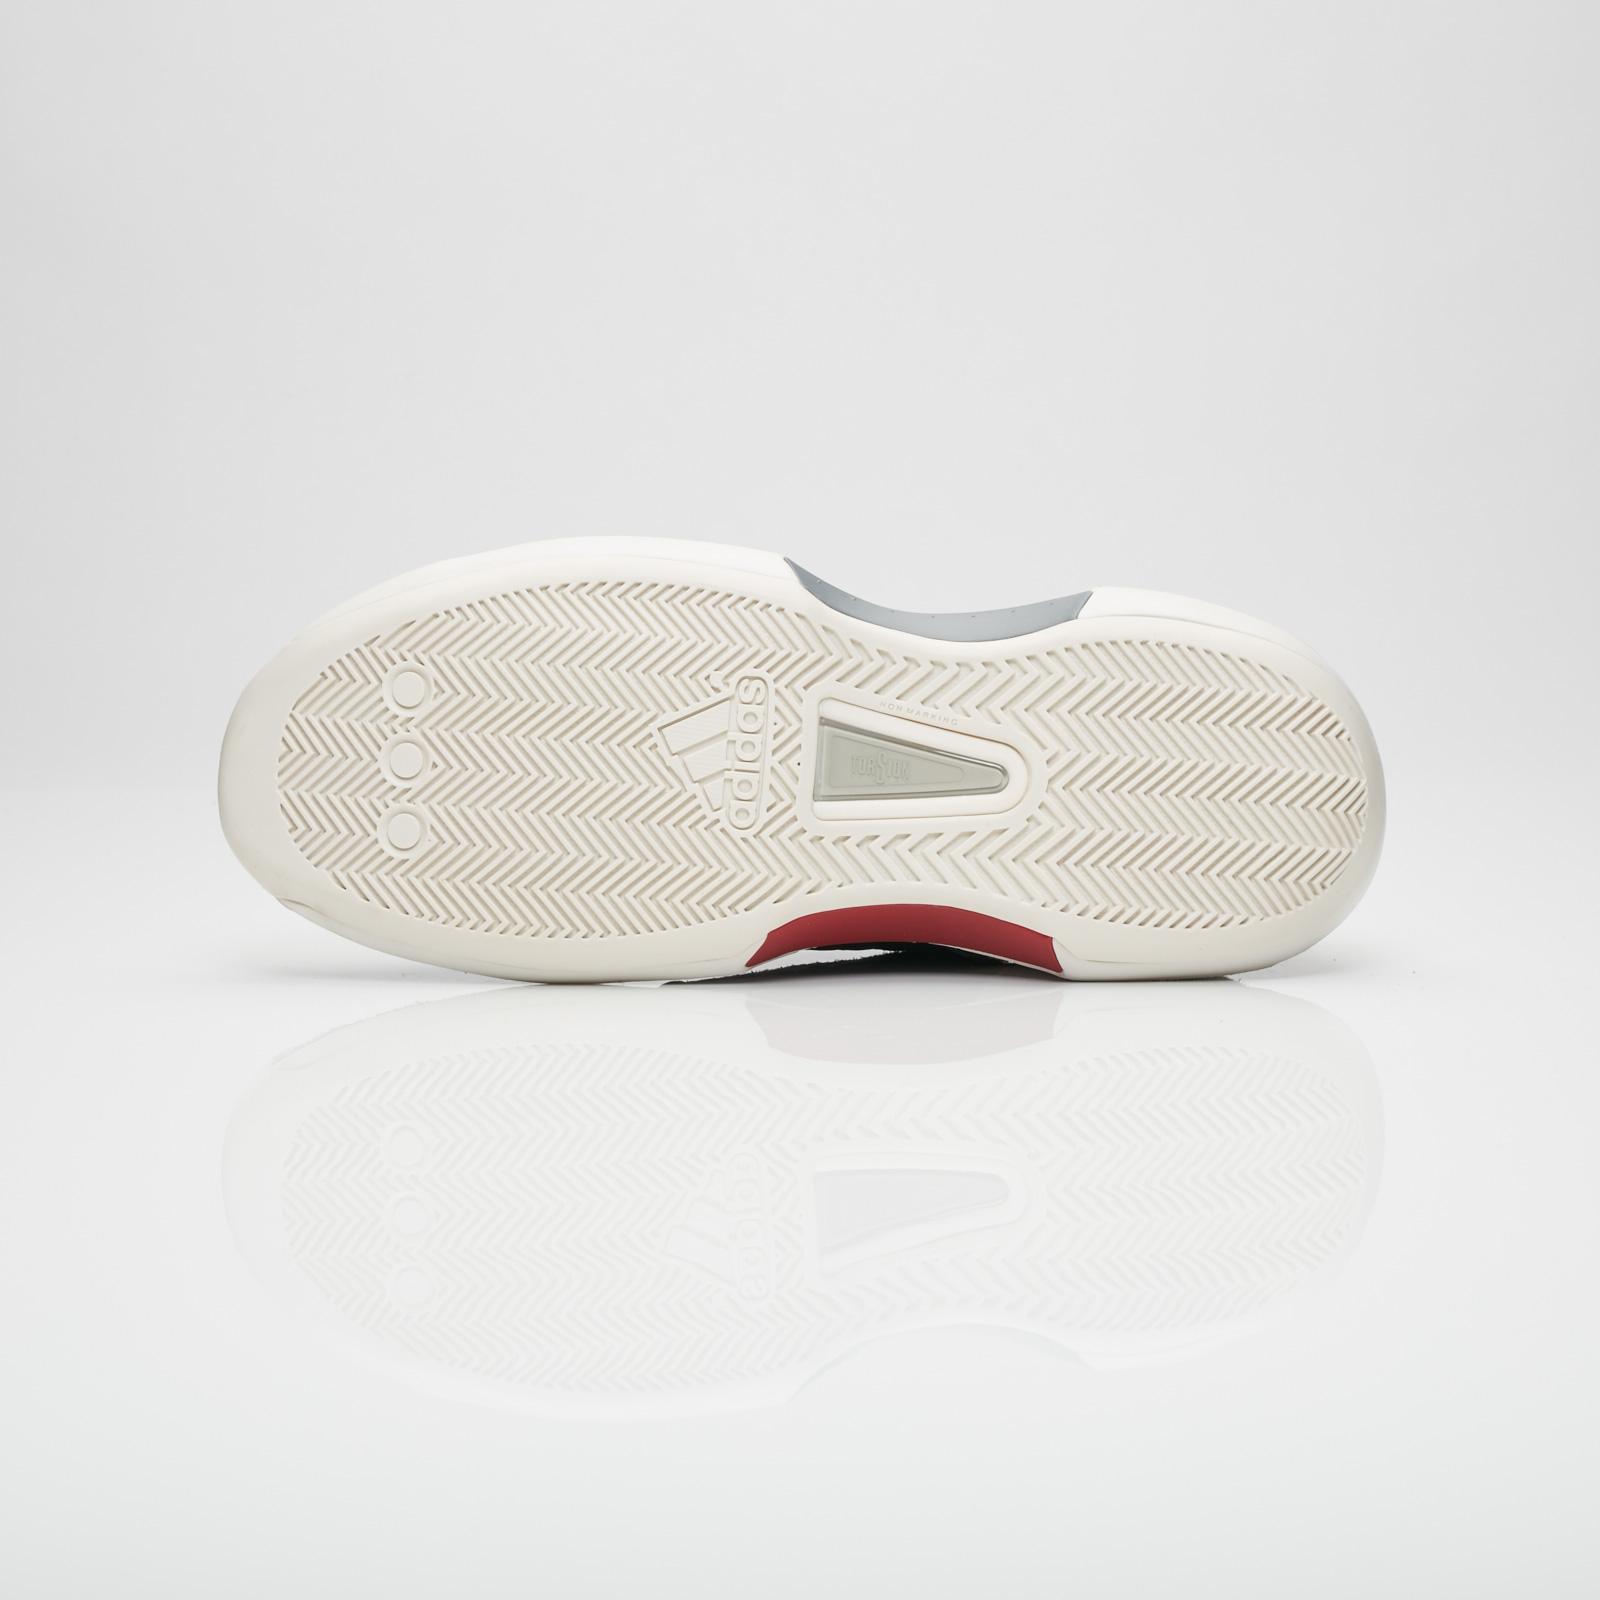 more photos d3696 9a77a ... adidas Consortium Crazy 1 ADV ...